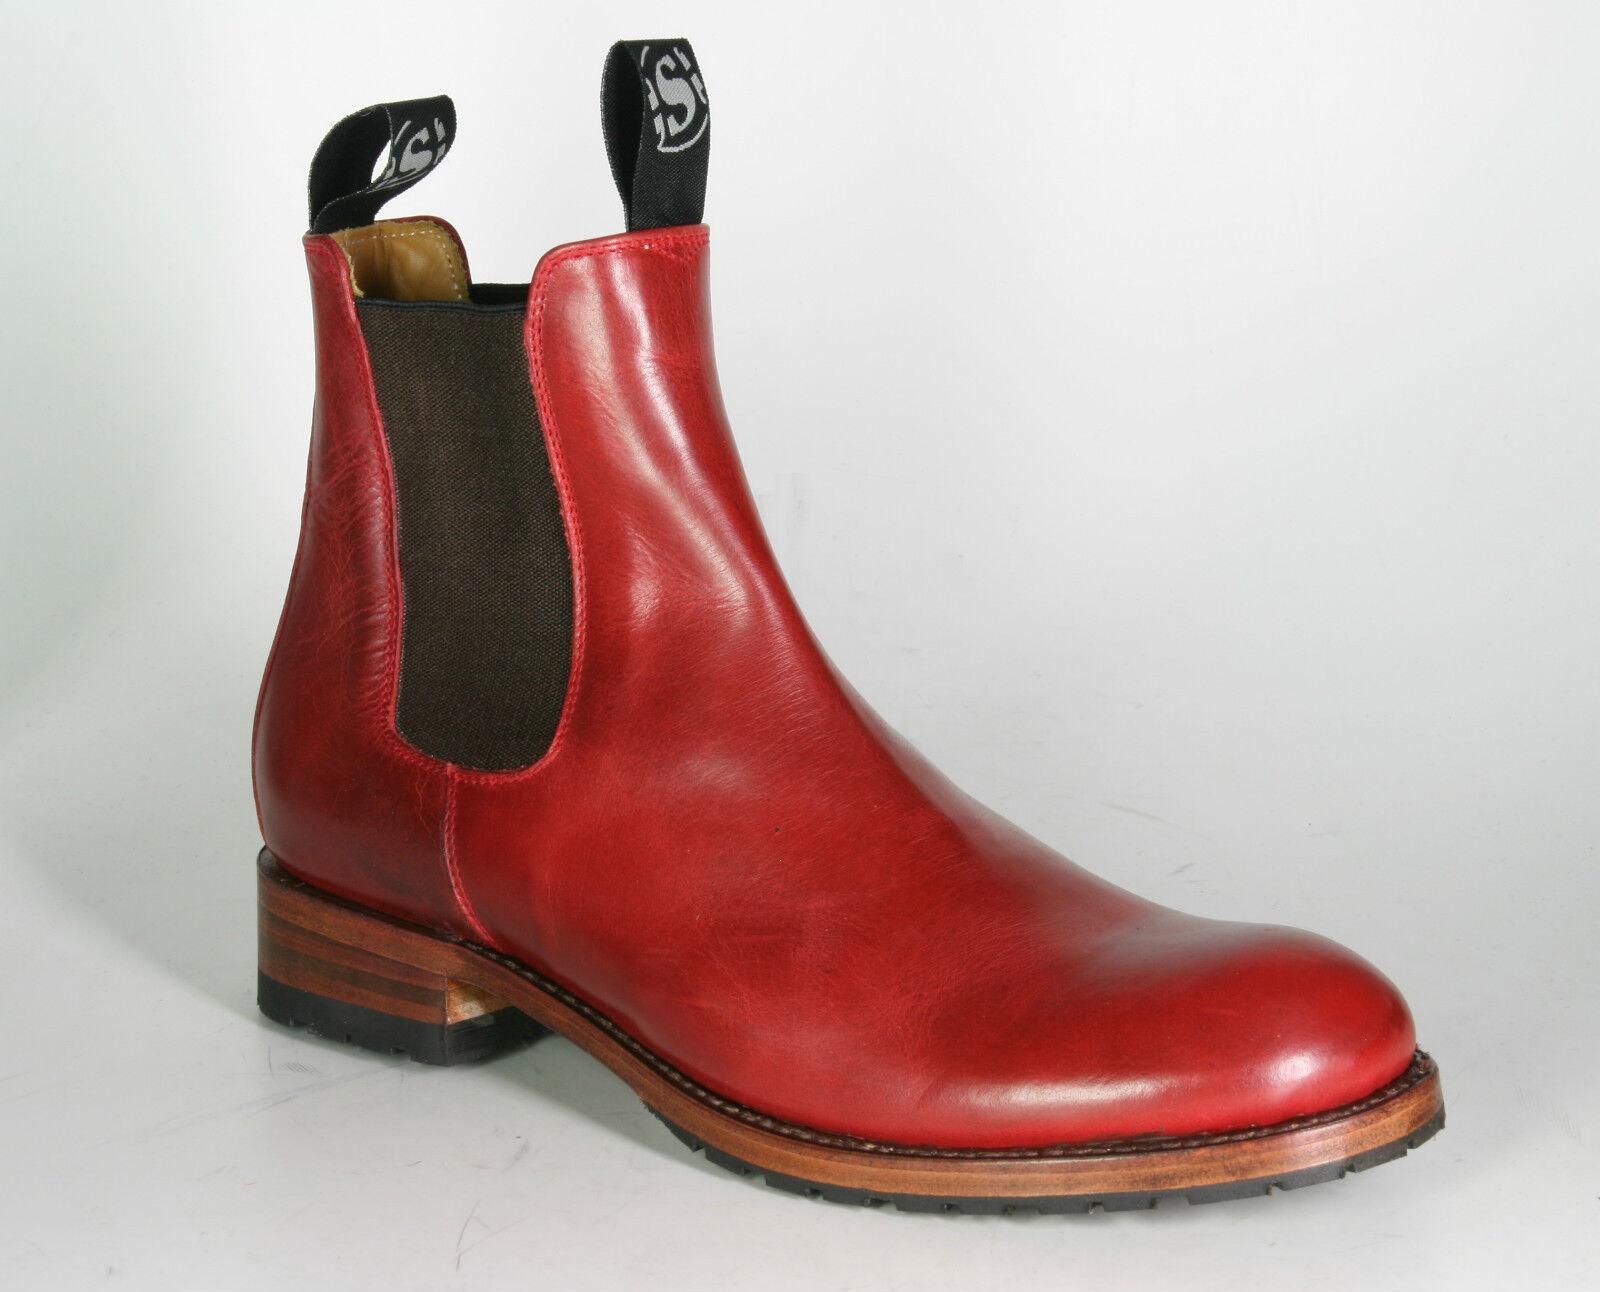 5595 5595 5595 Sendra Chelsea Stivaletti Boots Kaspar ROJO ROSSO b208a3